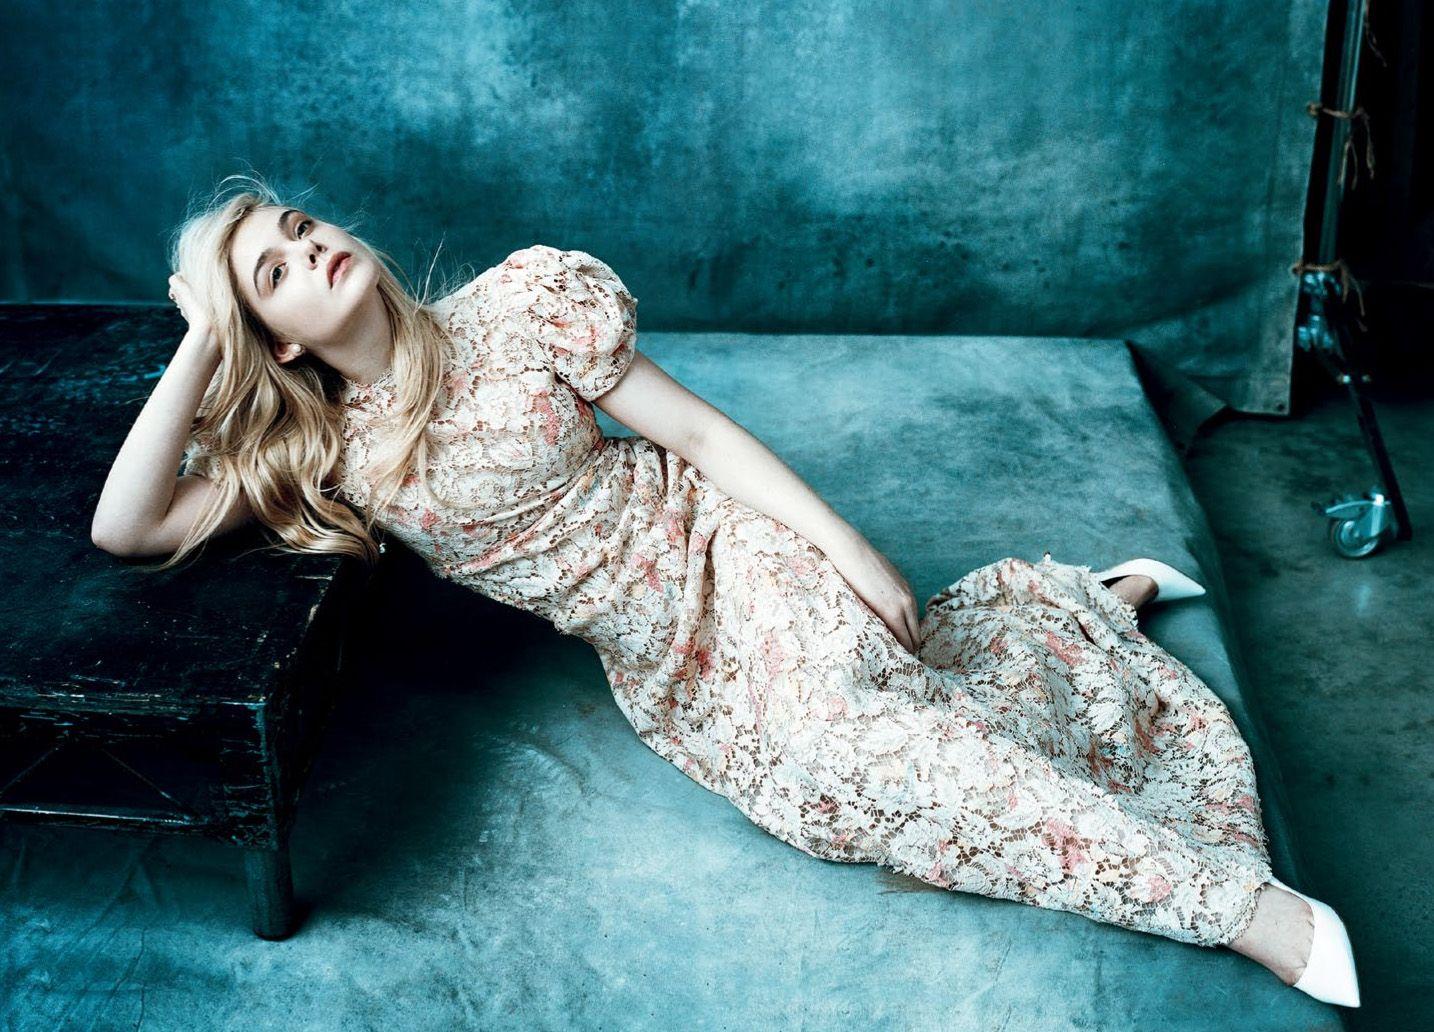 ELLE FANNING PHOTO SHOOTS | Elle Fanning blogspot ♥: Elle Fanning Norman Jean Roy photoshoot ...